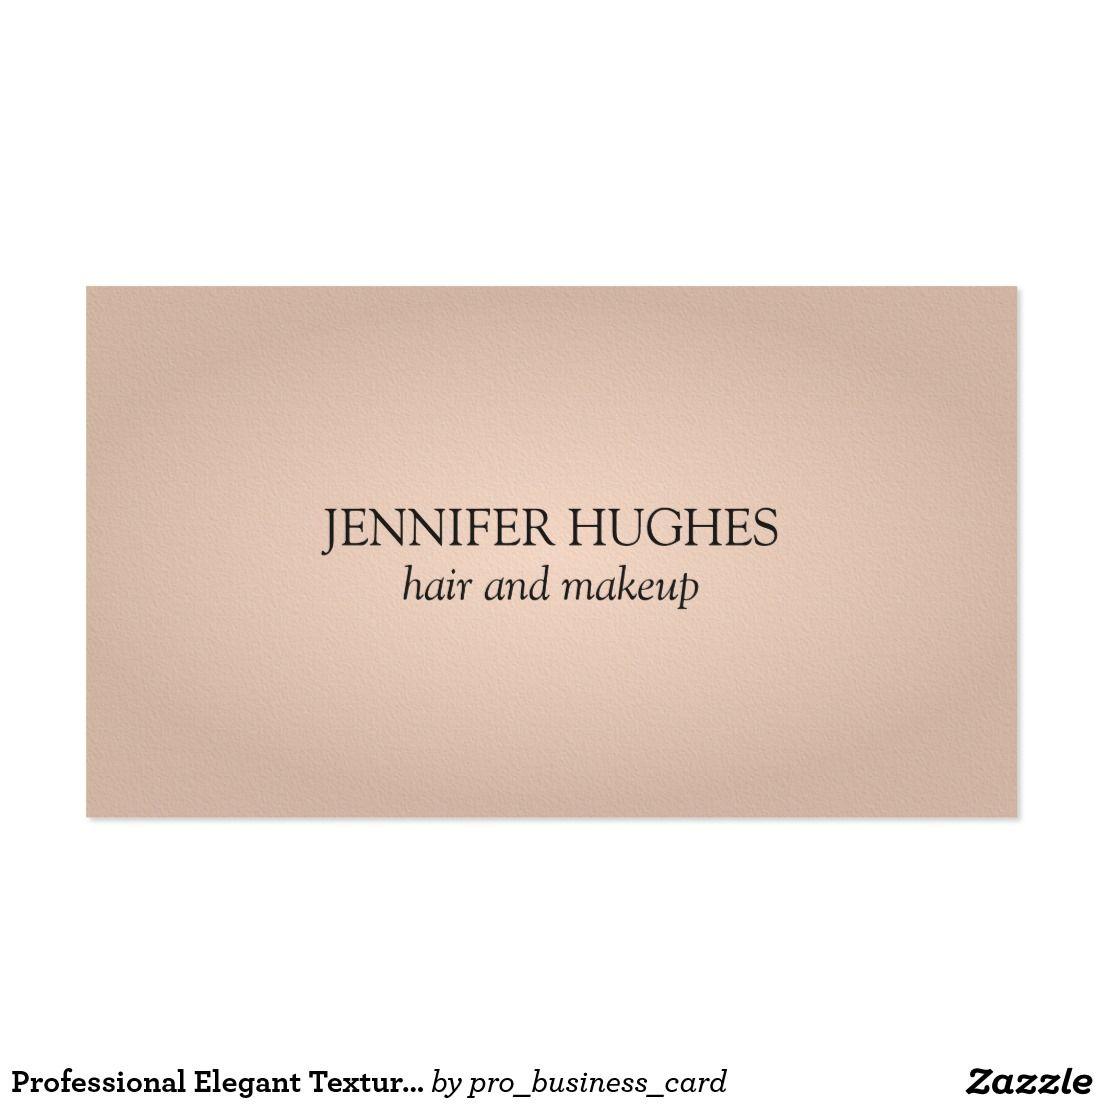 Professional Elegant Texture Rose Hair Makeup Business Card | Hair ...